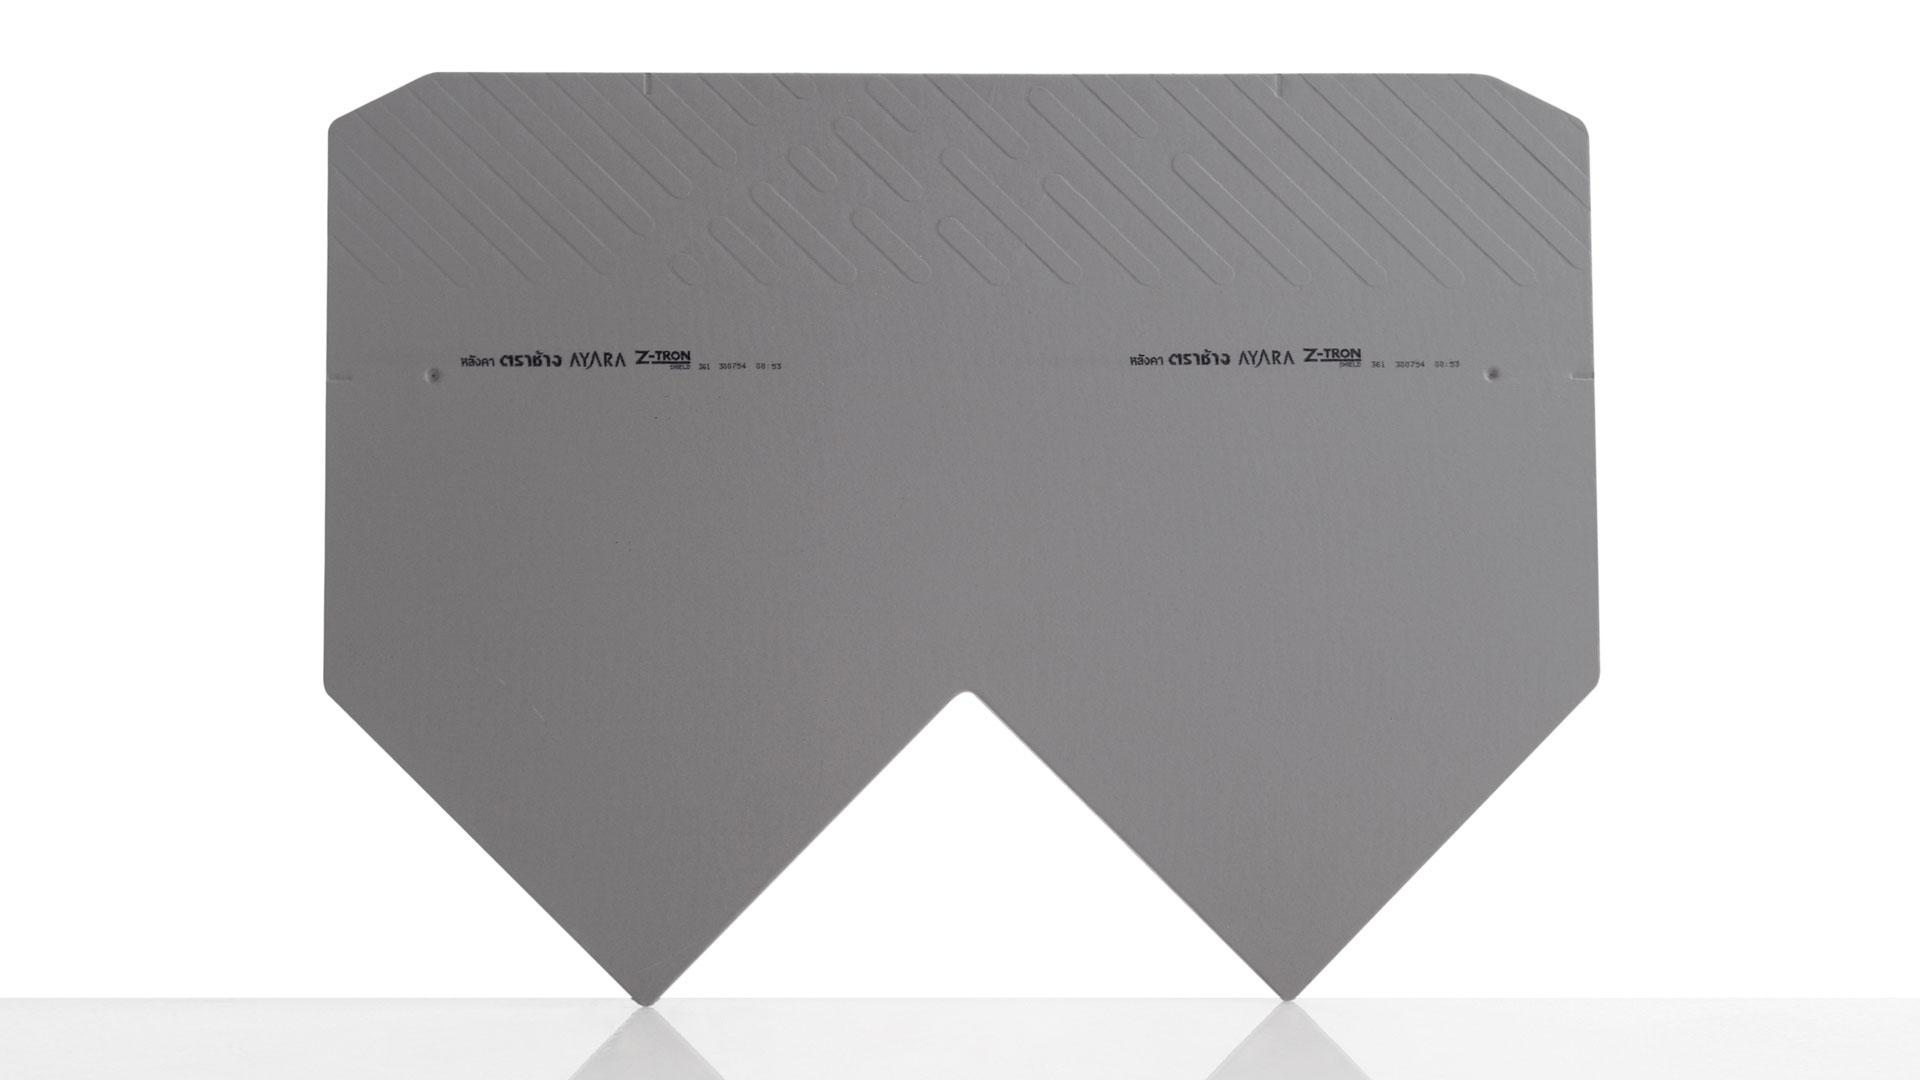 scg-roof-tile-ayara-classic-marble-grey-packshot-01.jpg